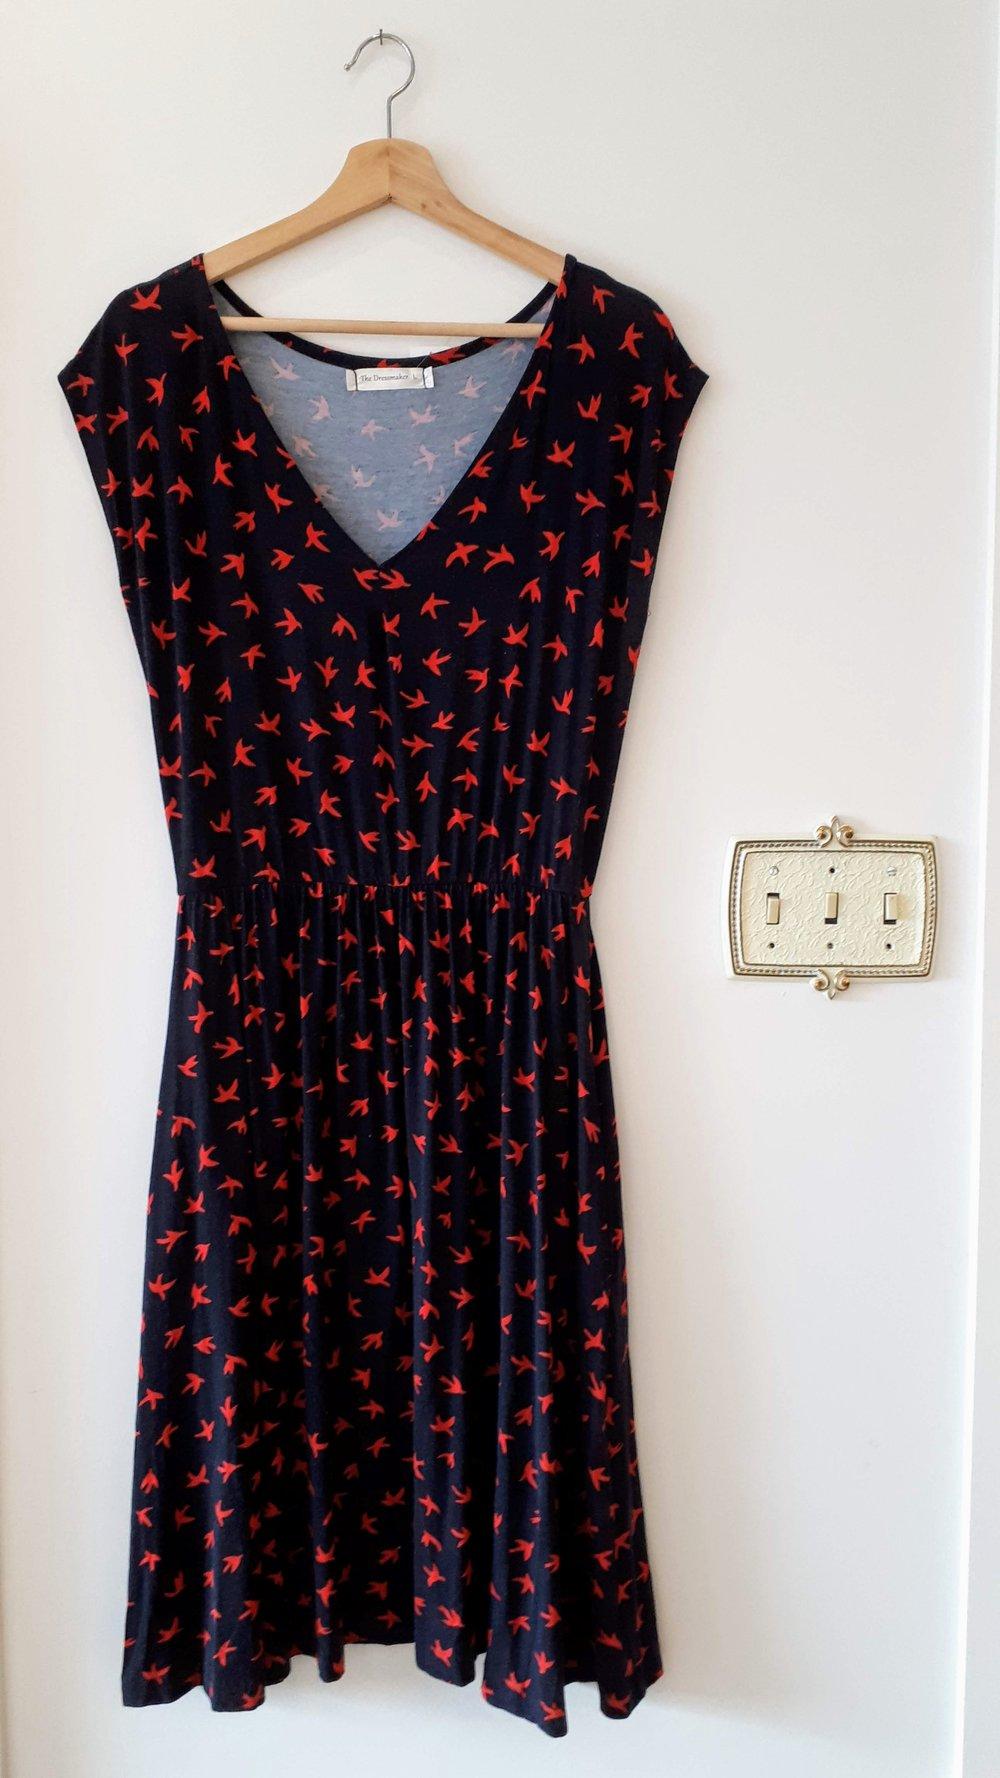 The Dressmaker dress; Size L, $40